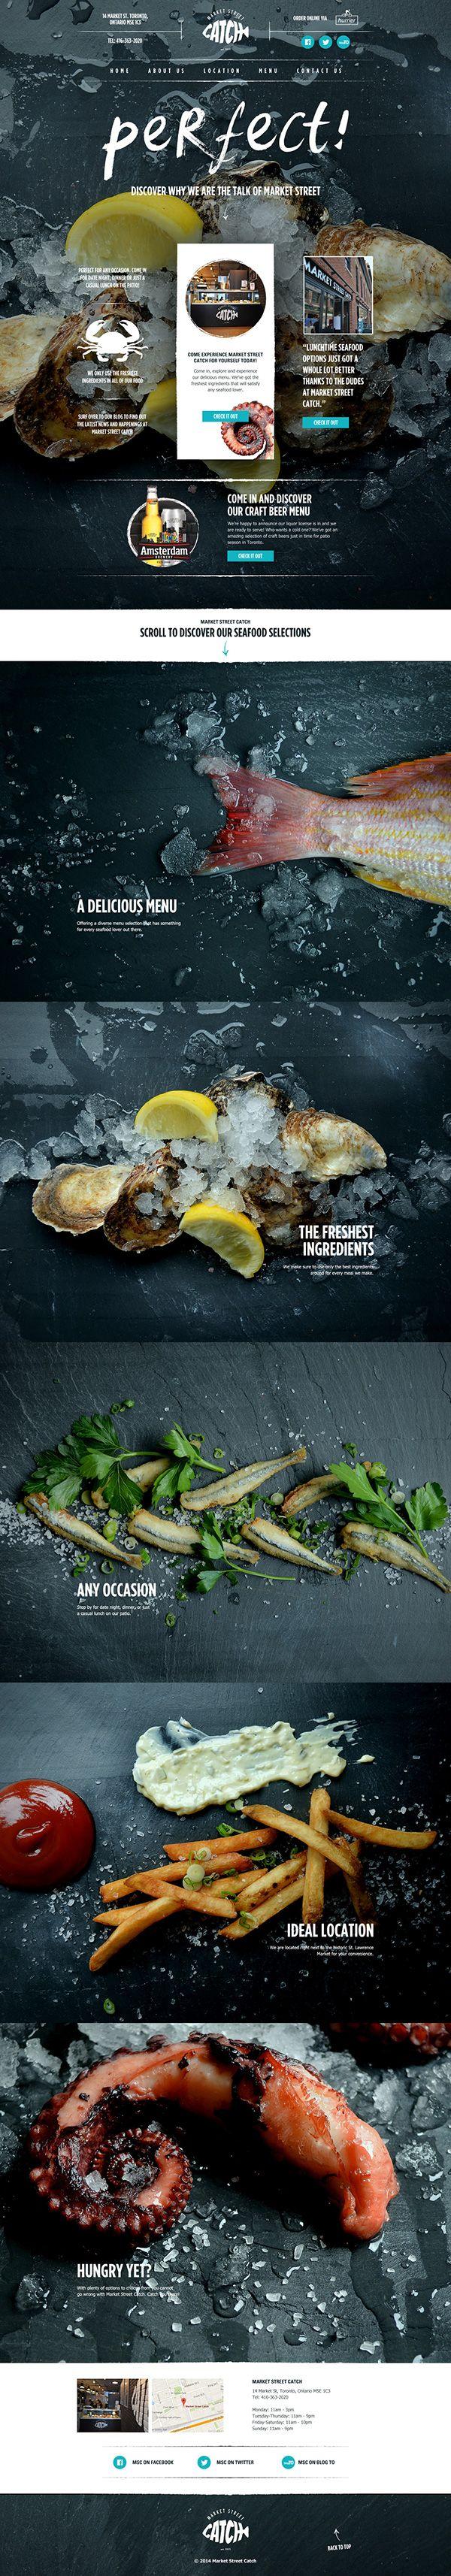 Website for Market Street Catch, a seafood restaurant in Toronto, Ontario.www.marketstreetcatch.com